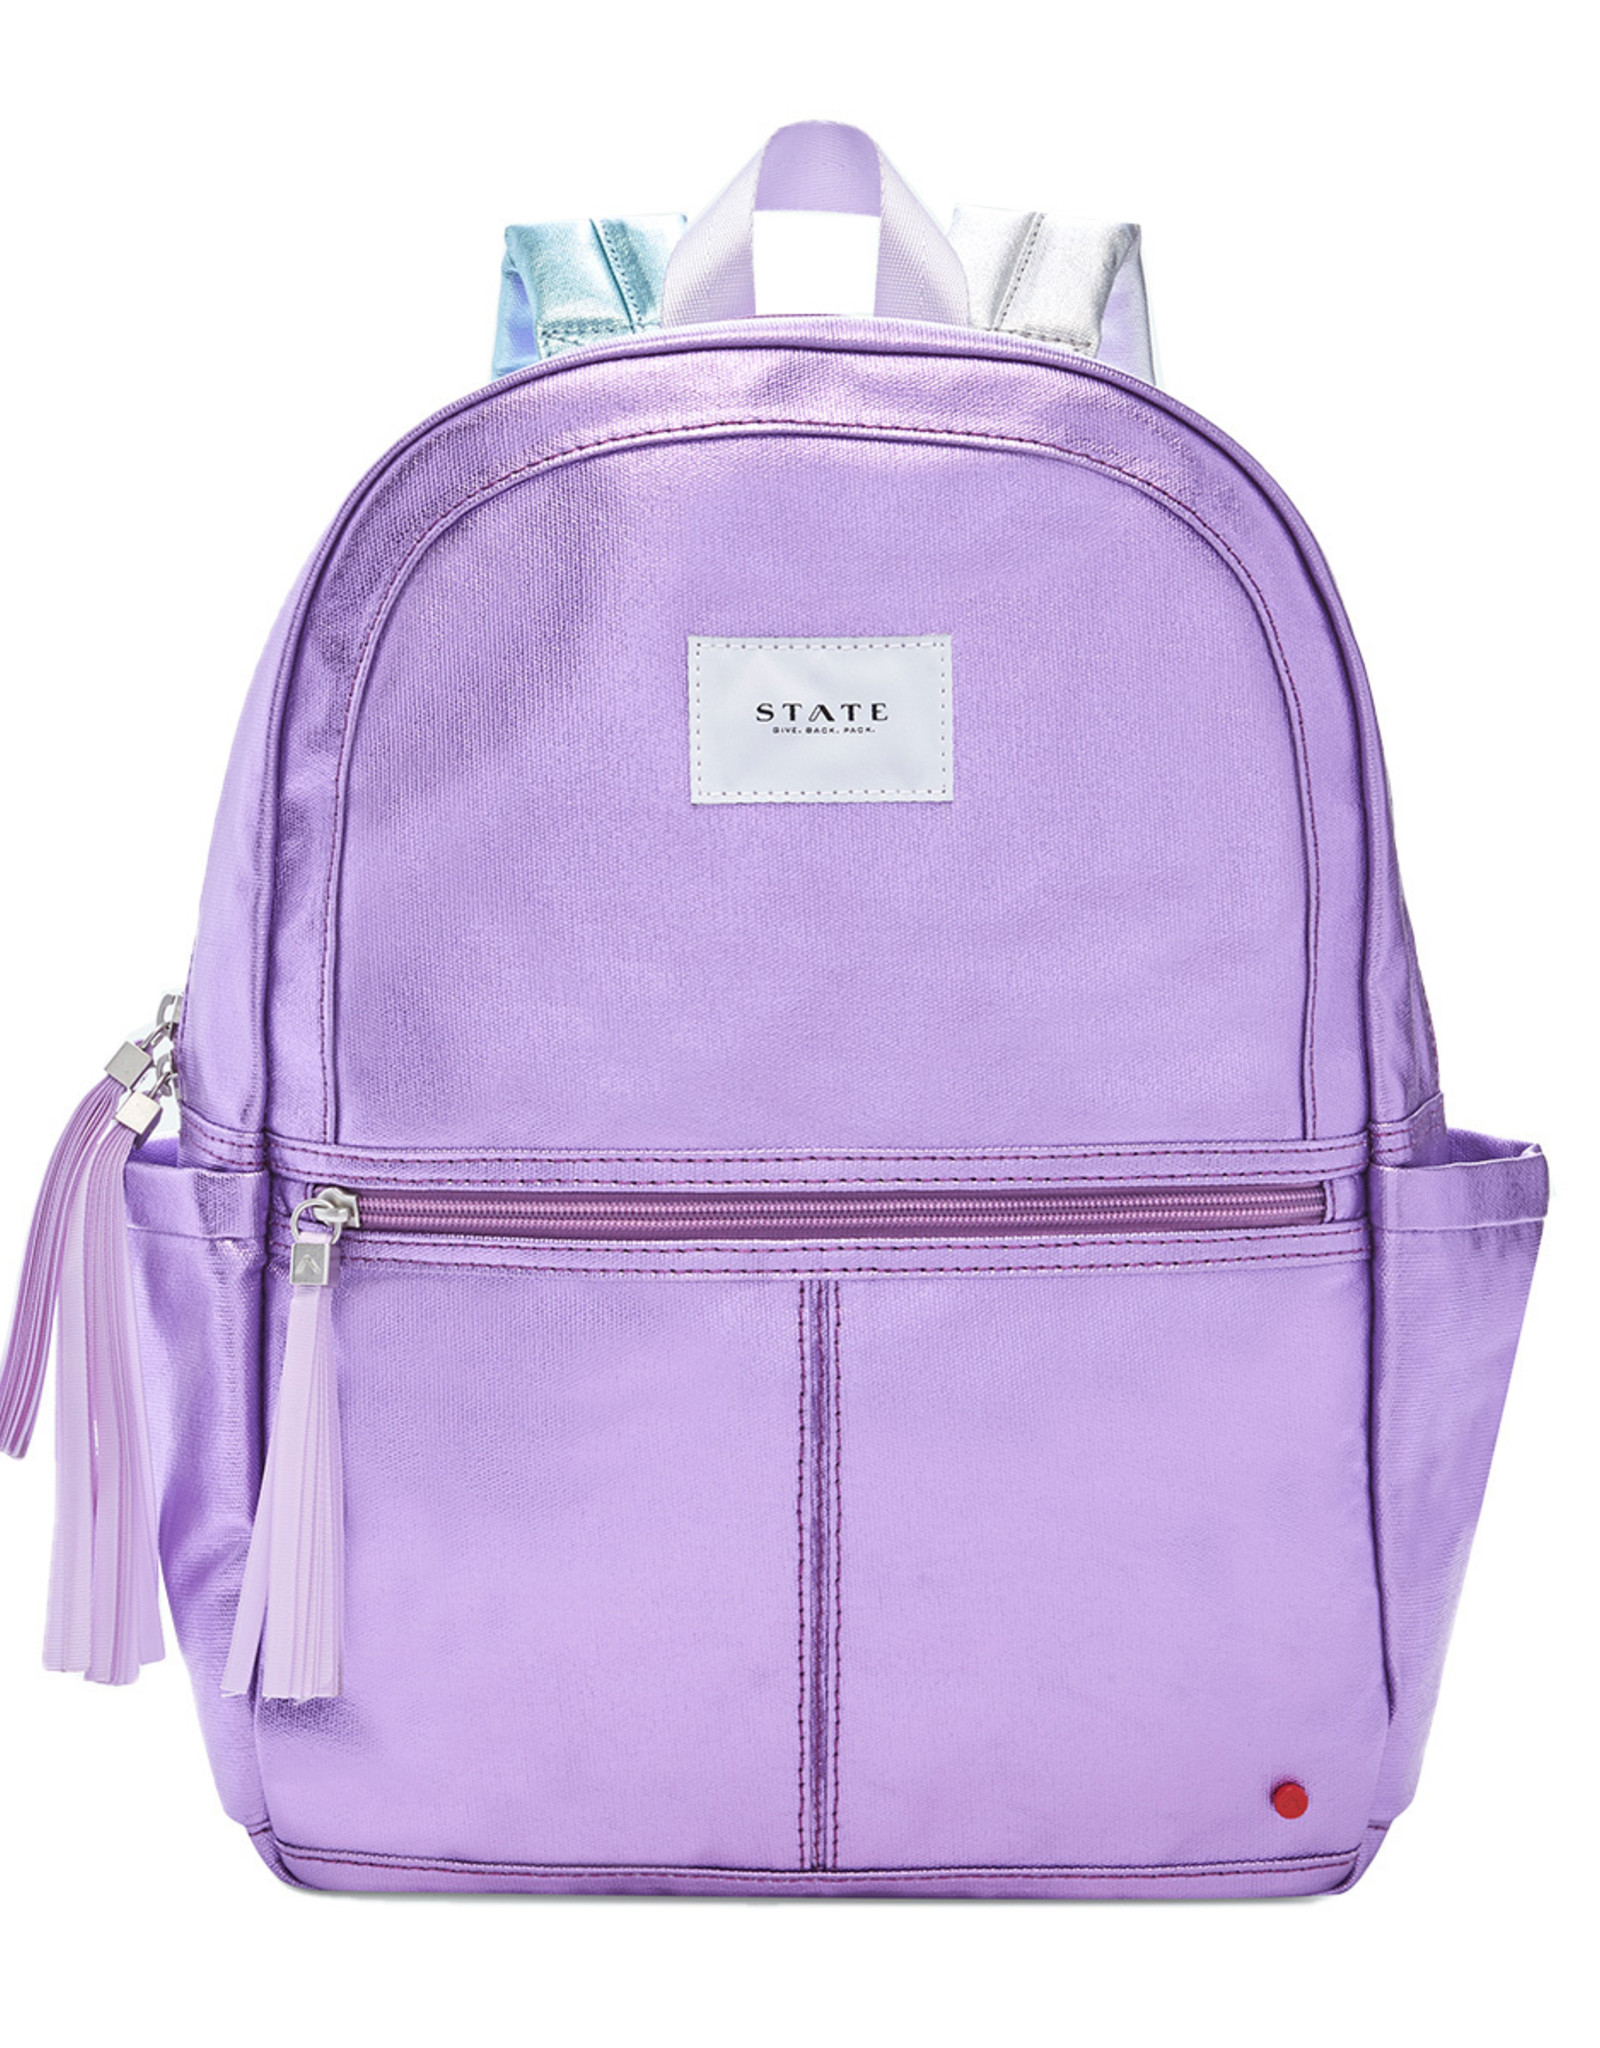 STATE Kane Kids Backpack - Purple Multi Metallic